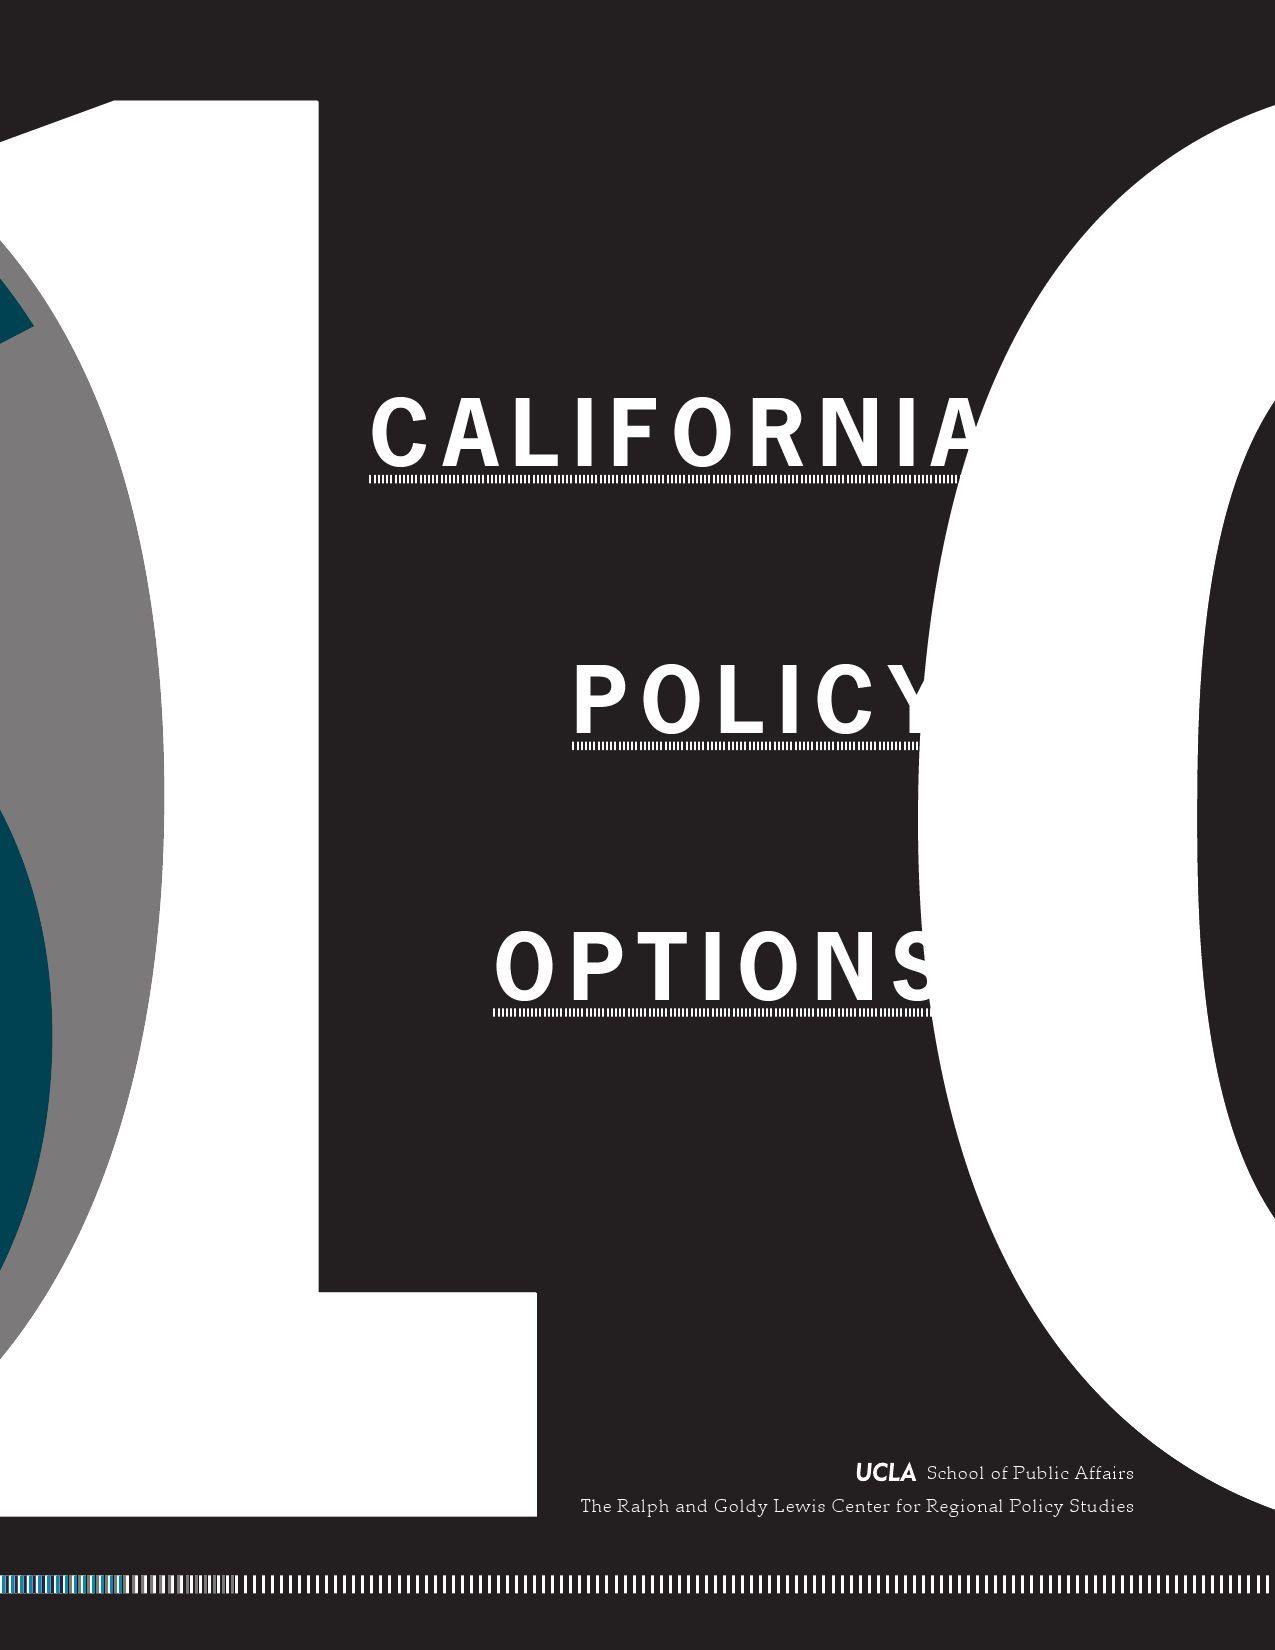 California Policy Options 2010 by UCLA Luskin School of Public